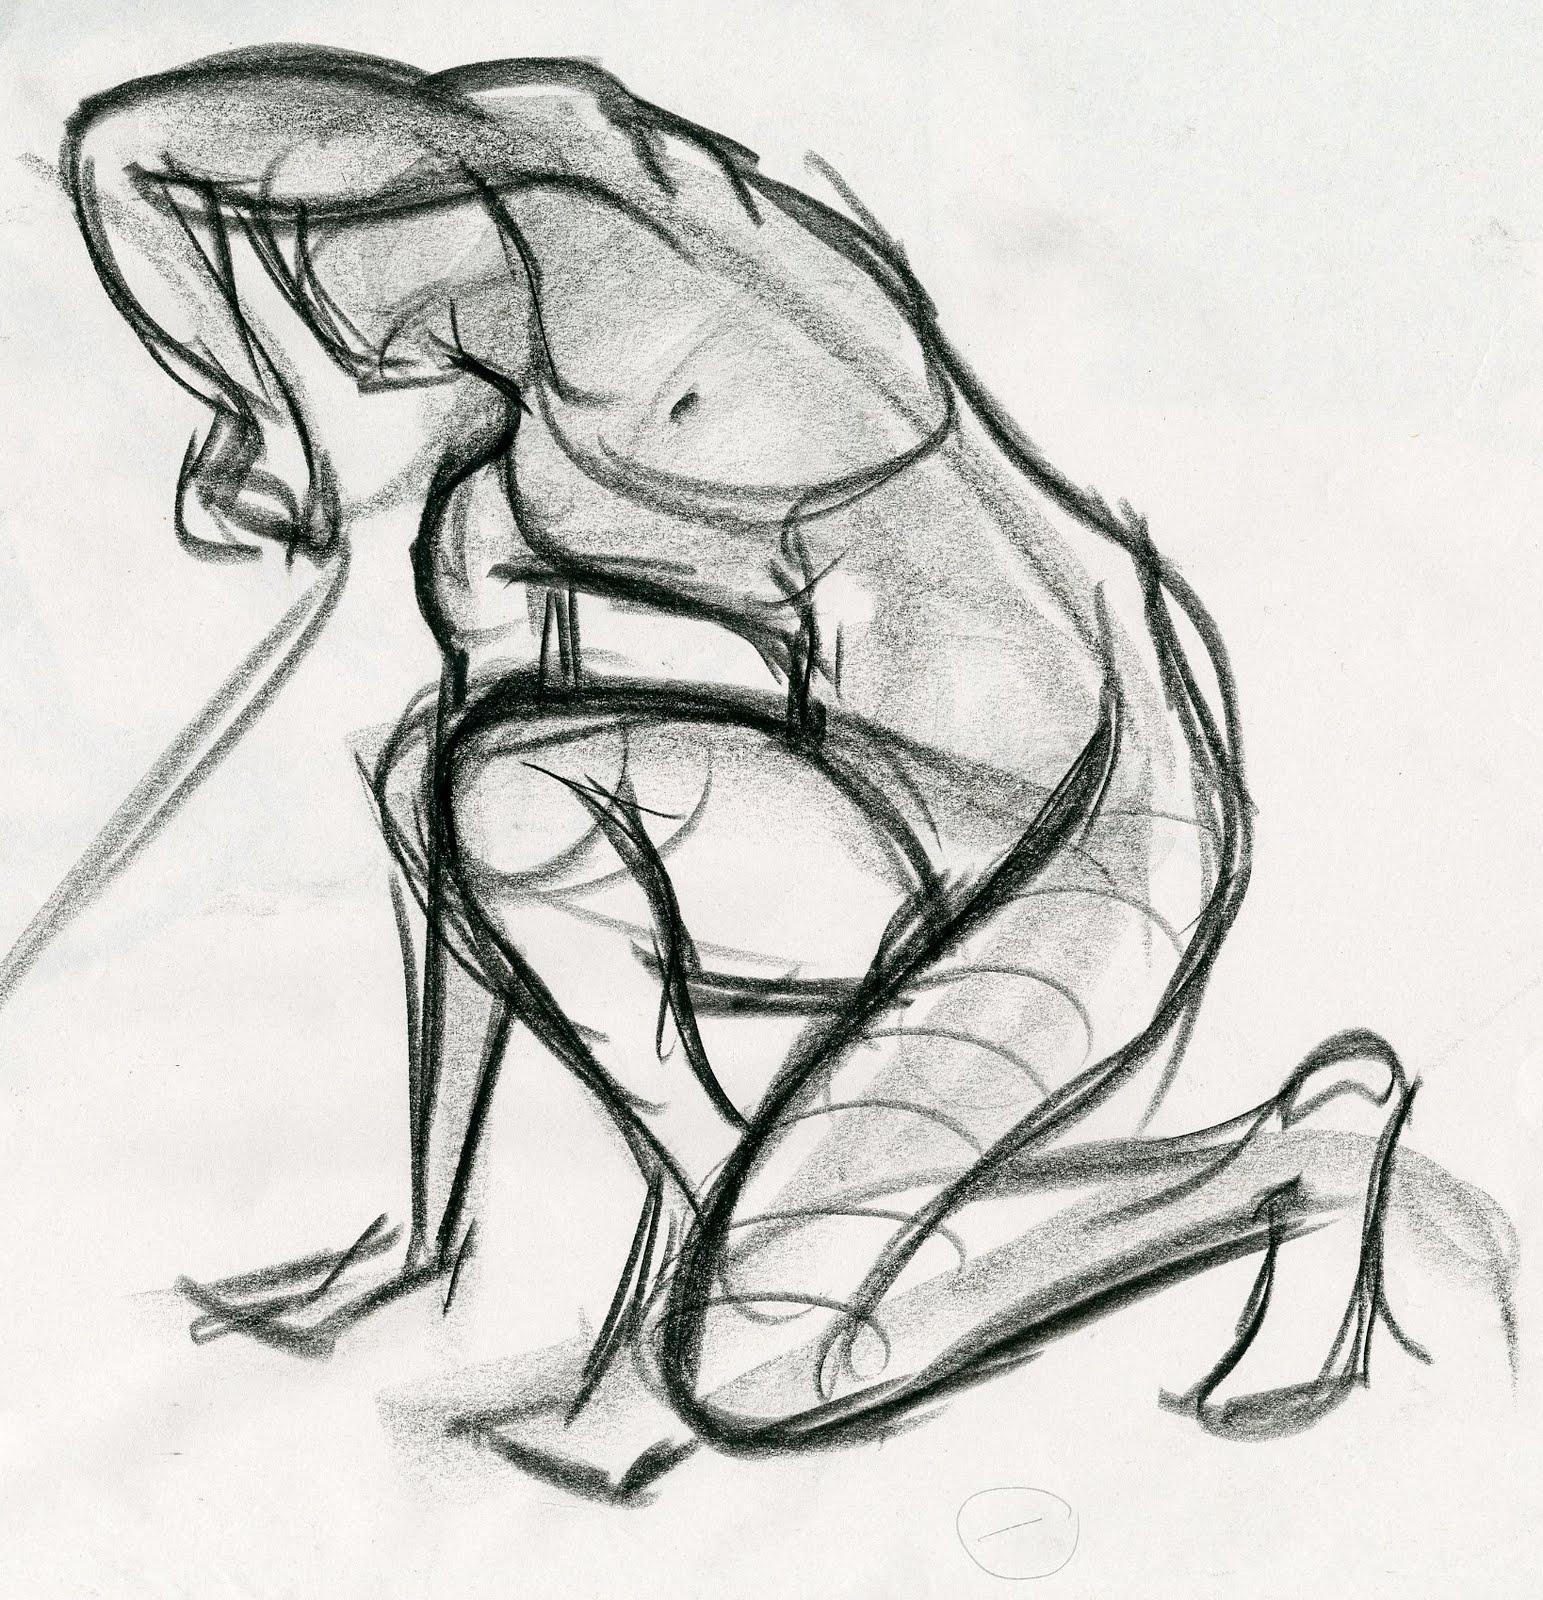 Scribble Gesture Drawing : Scribble scraps life drawing gestures